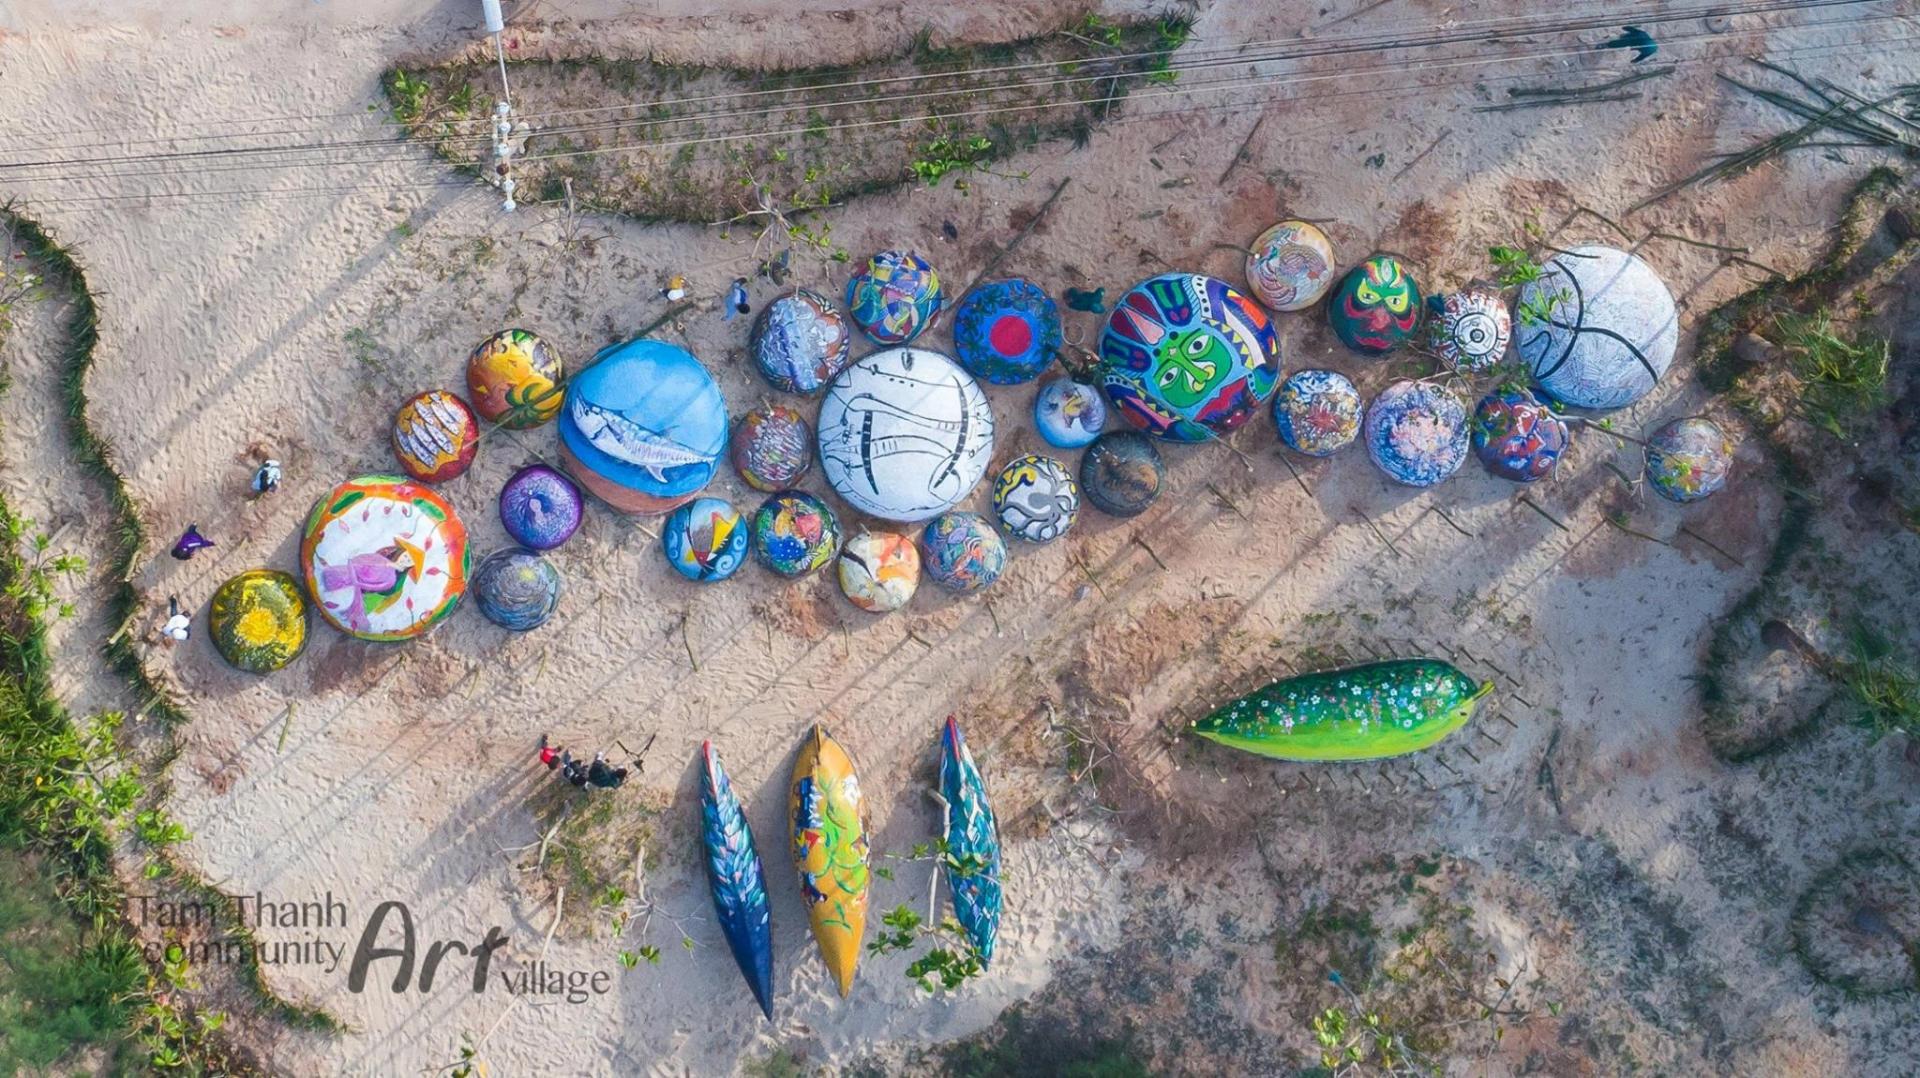 Photo: Tam Thanh Community Art Village